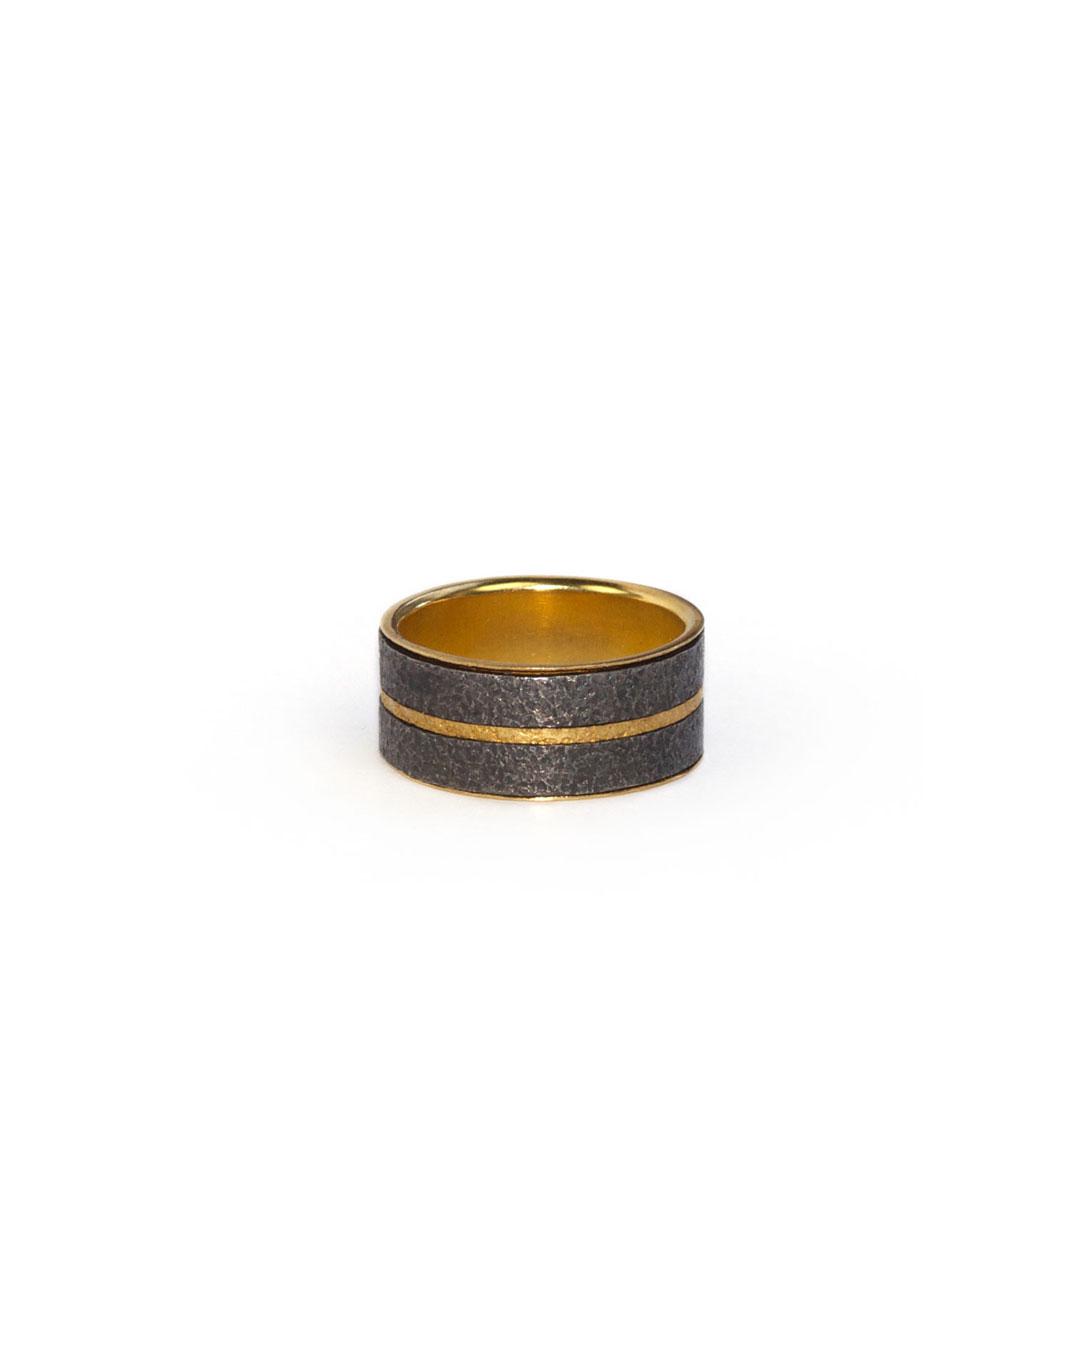 Okinari Kurokawa, untitled, 2008, ring; 20ct gold, silver, 23 x 9 mm, €1600